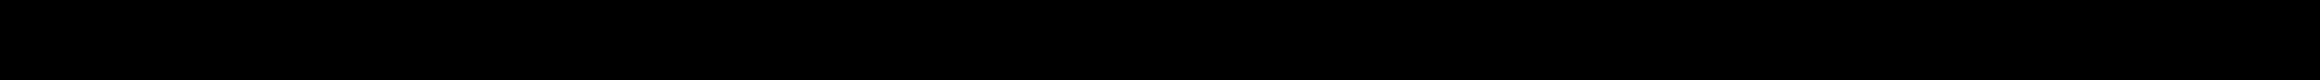 MANN-FILTER 4920158, 1103827, 4-9540000111, 76-11900535100, 76-12915035151 Oliefilter